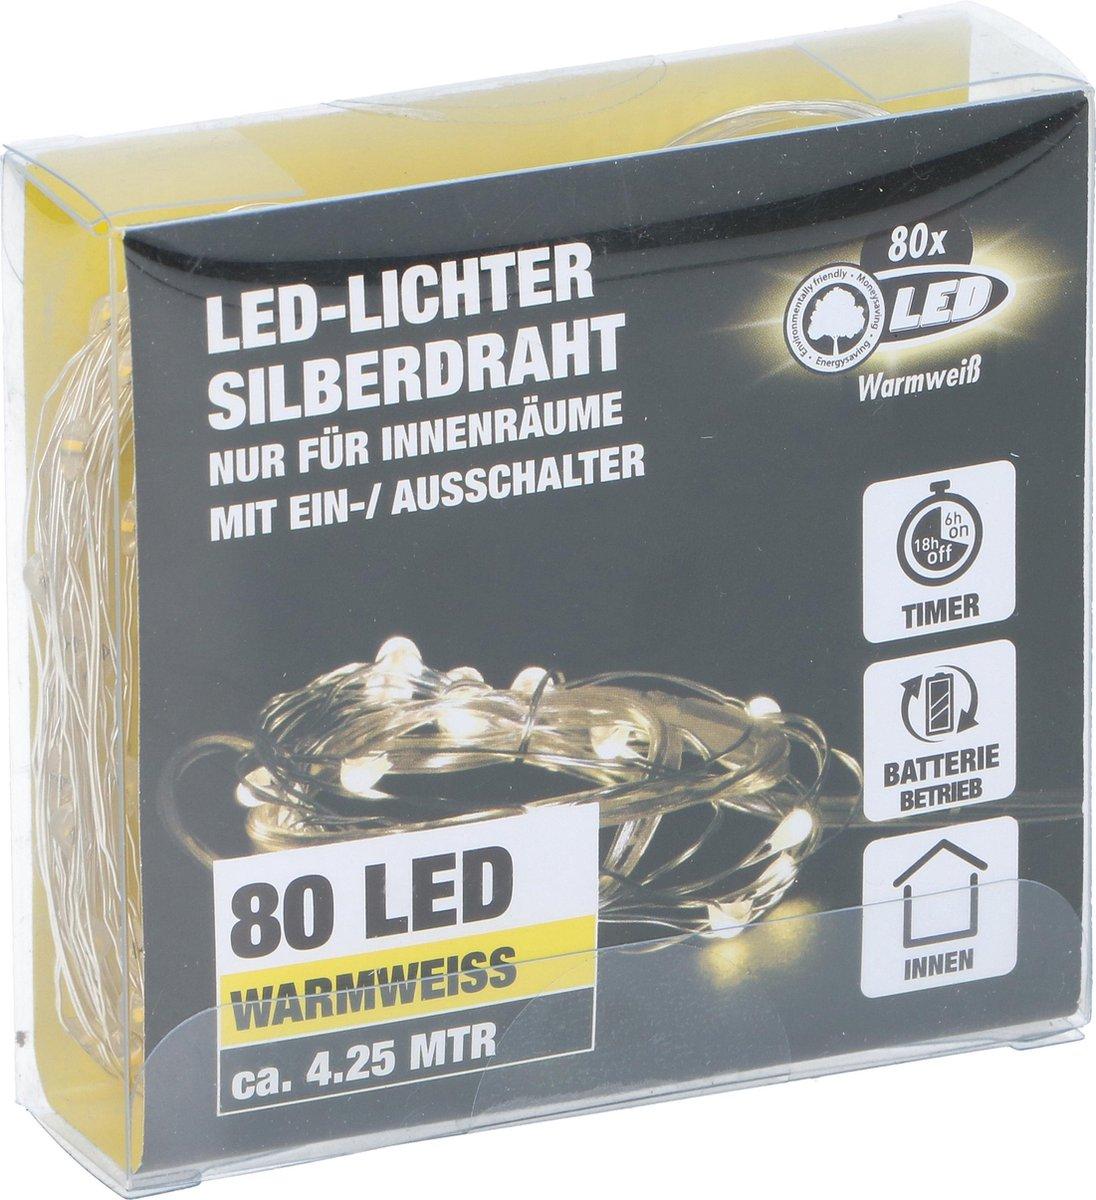 80 led warm wit ledsnoer, kerstlampjes 425cm, kindercrea